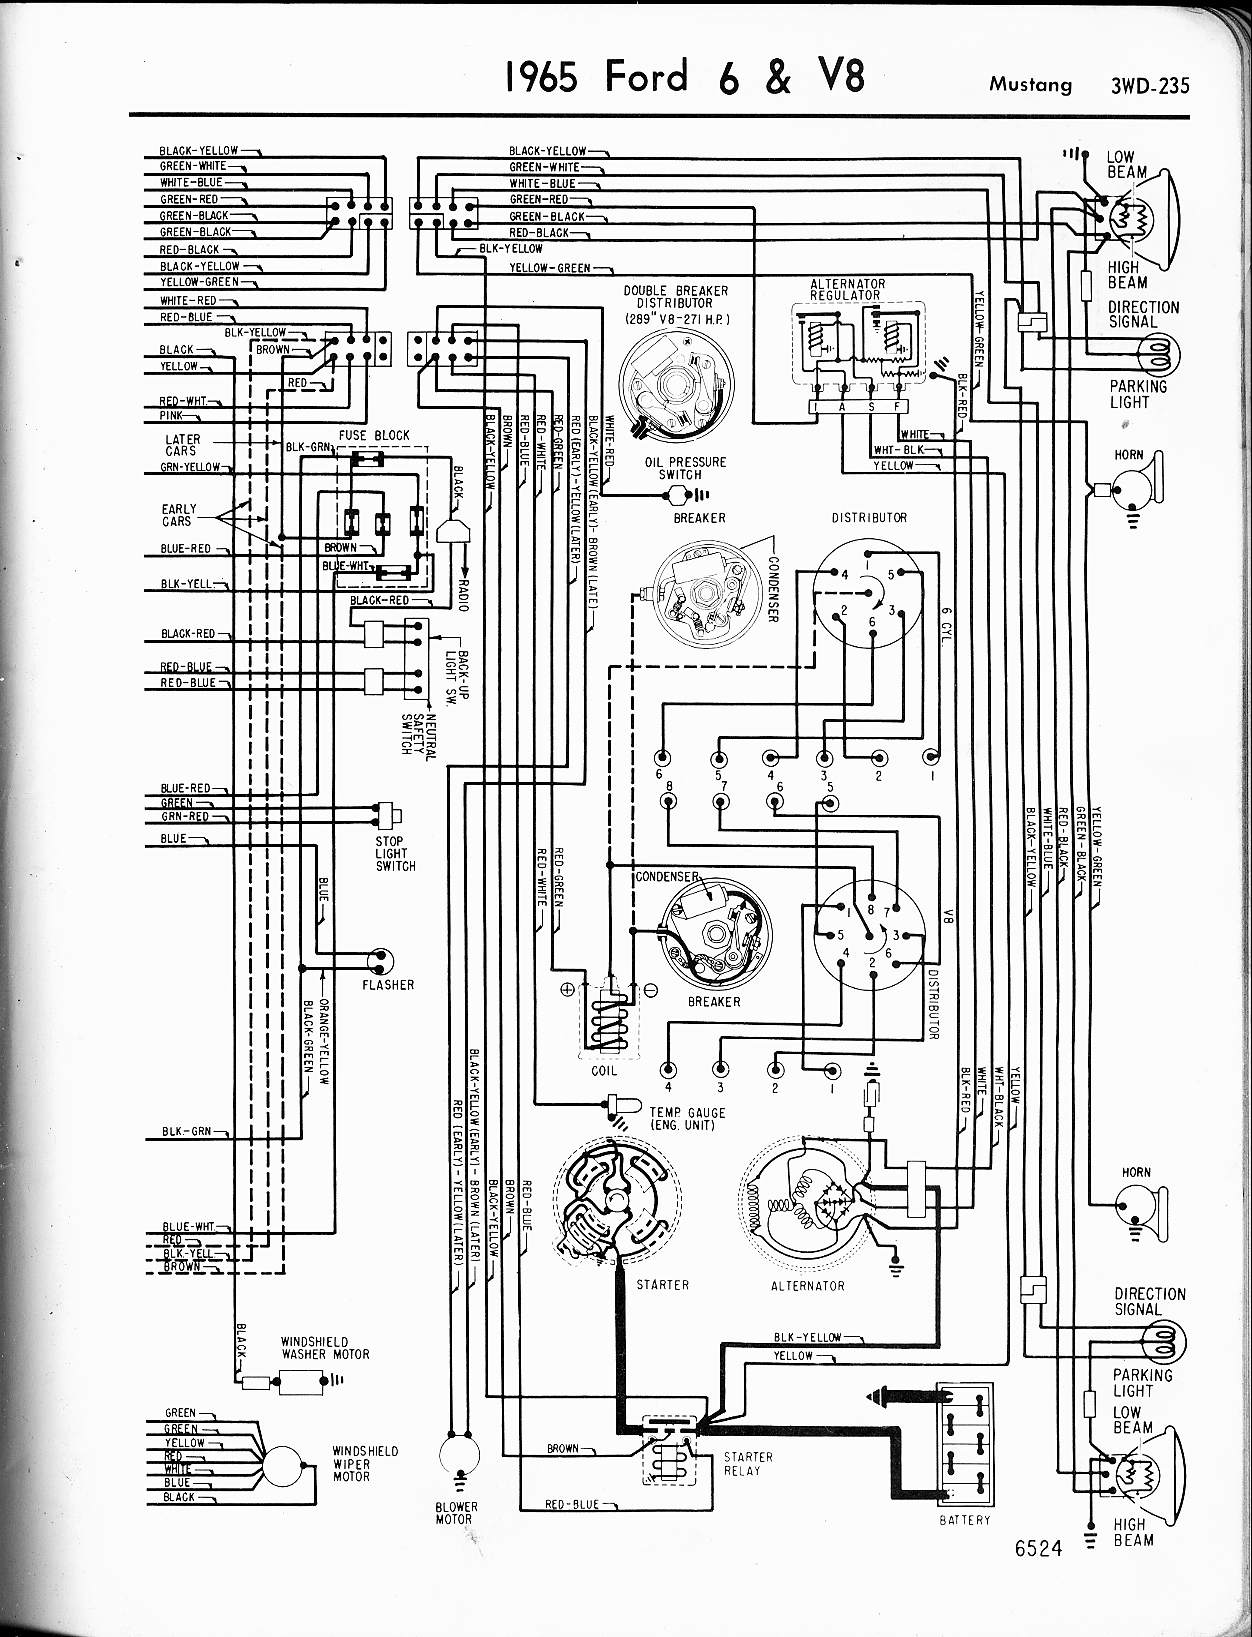 Prime 1965 Ford Wiring Schematic Wiring Diagram Database Wiring Cloud Biosomenaidewilluminateatxorg